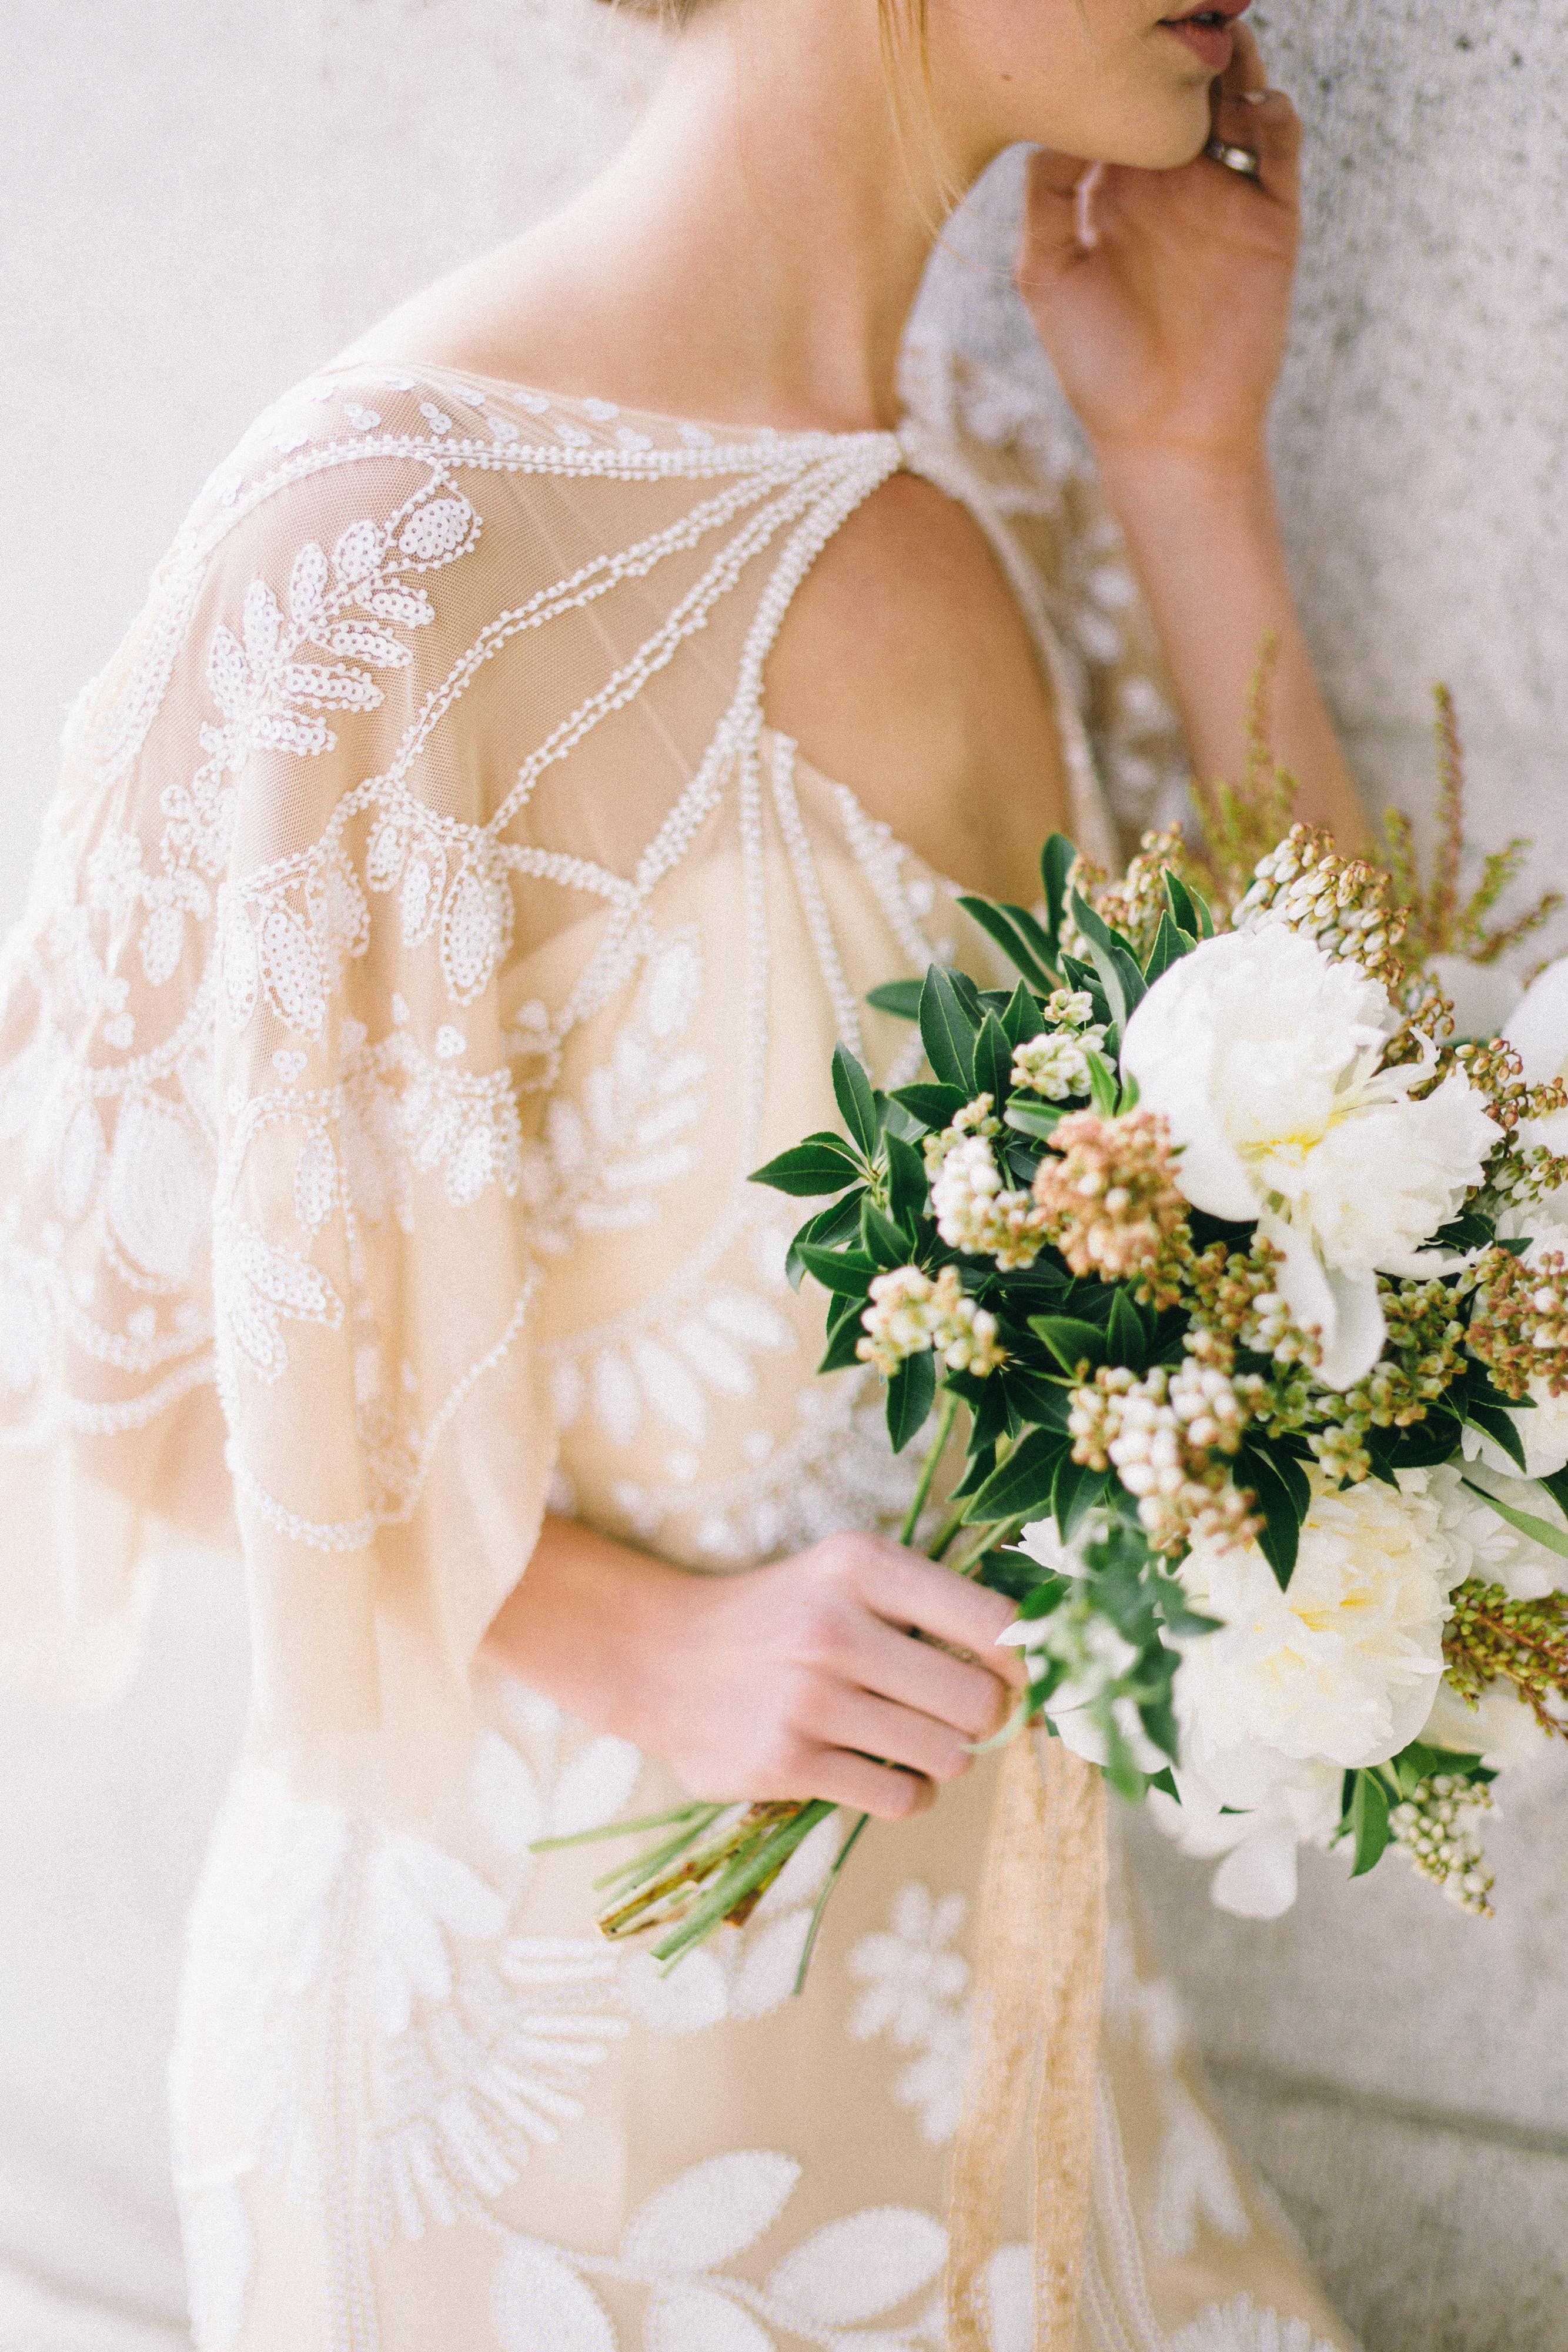 Parisian Shoot with Rue de Seine  Featured on Grey Likes Weddings